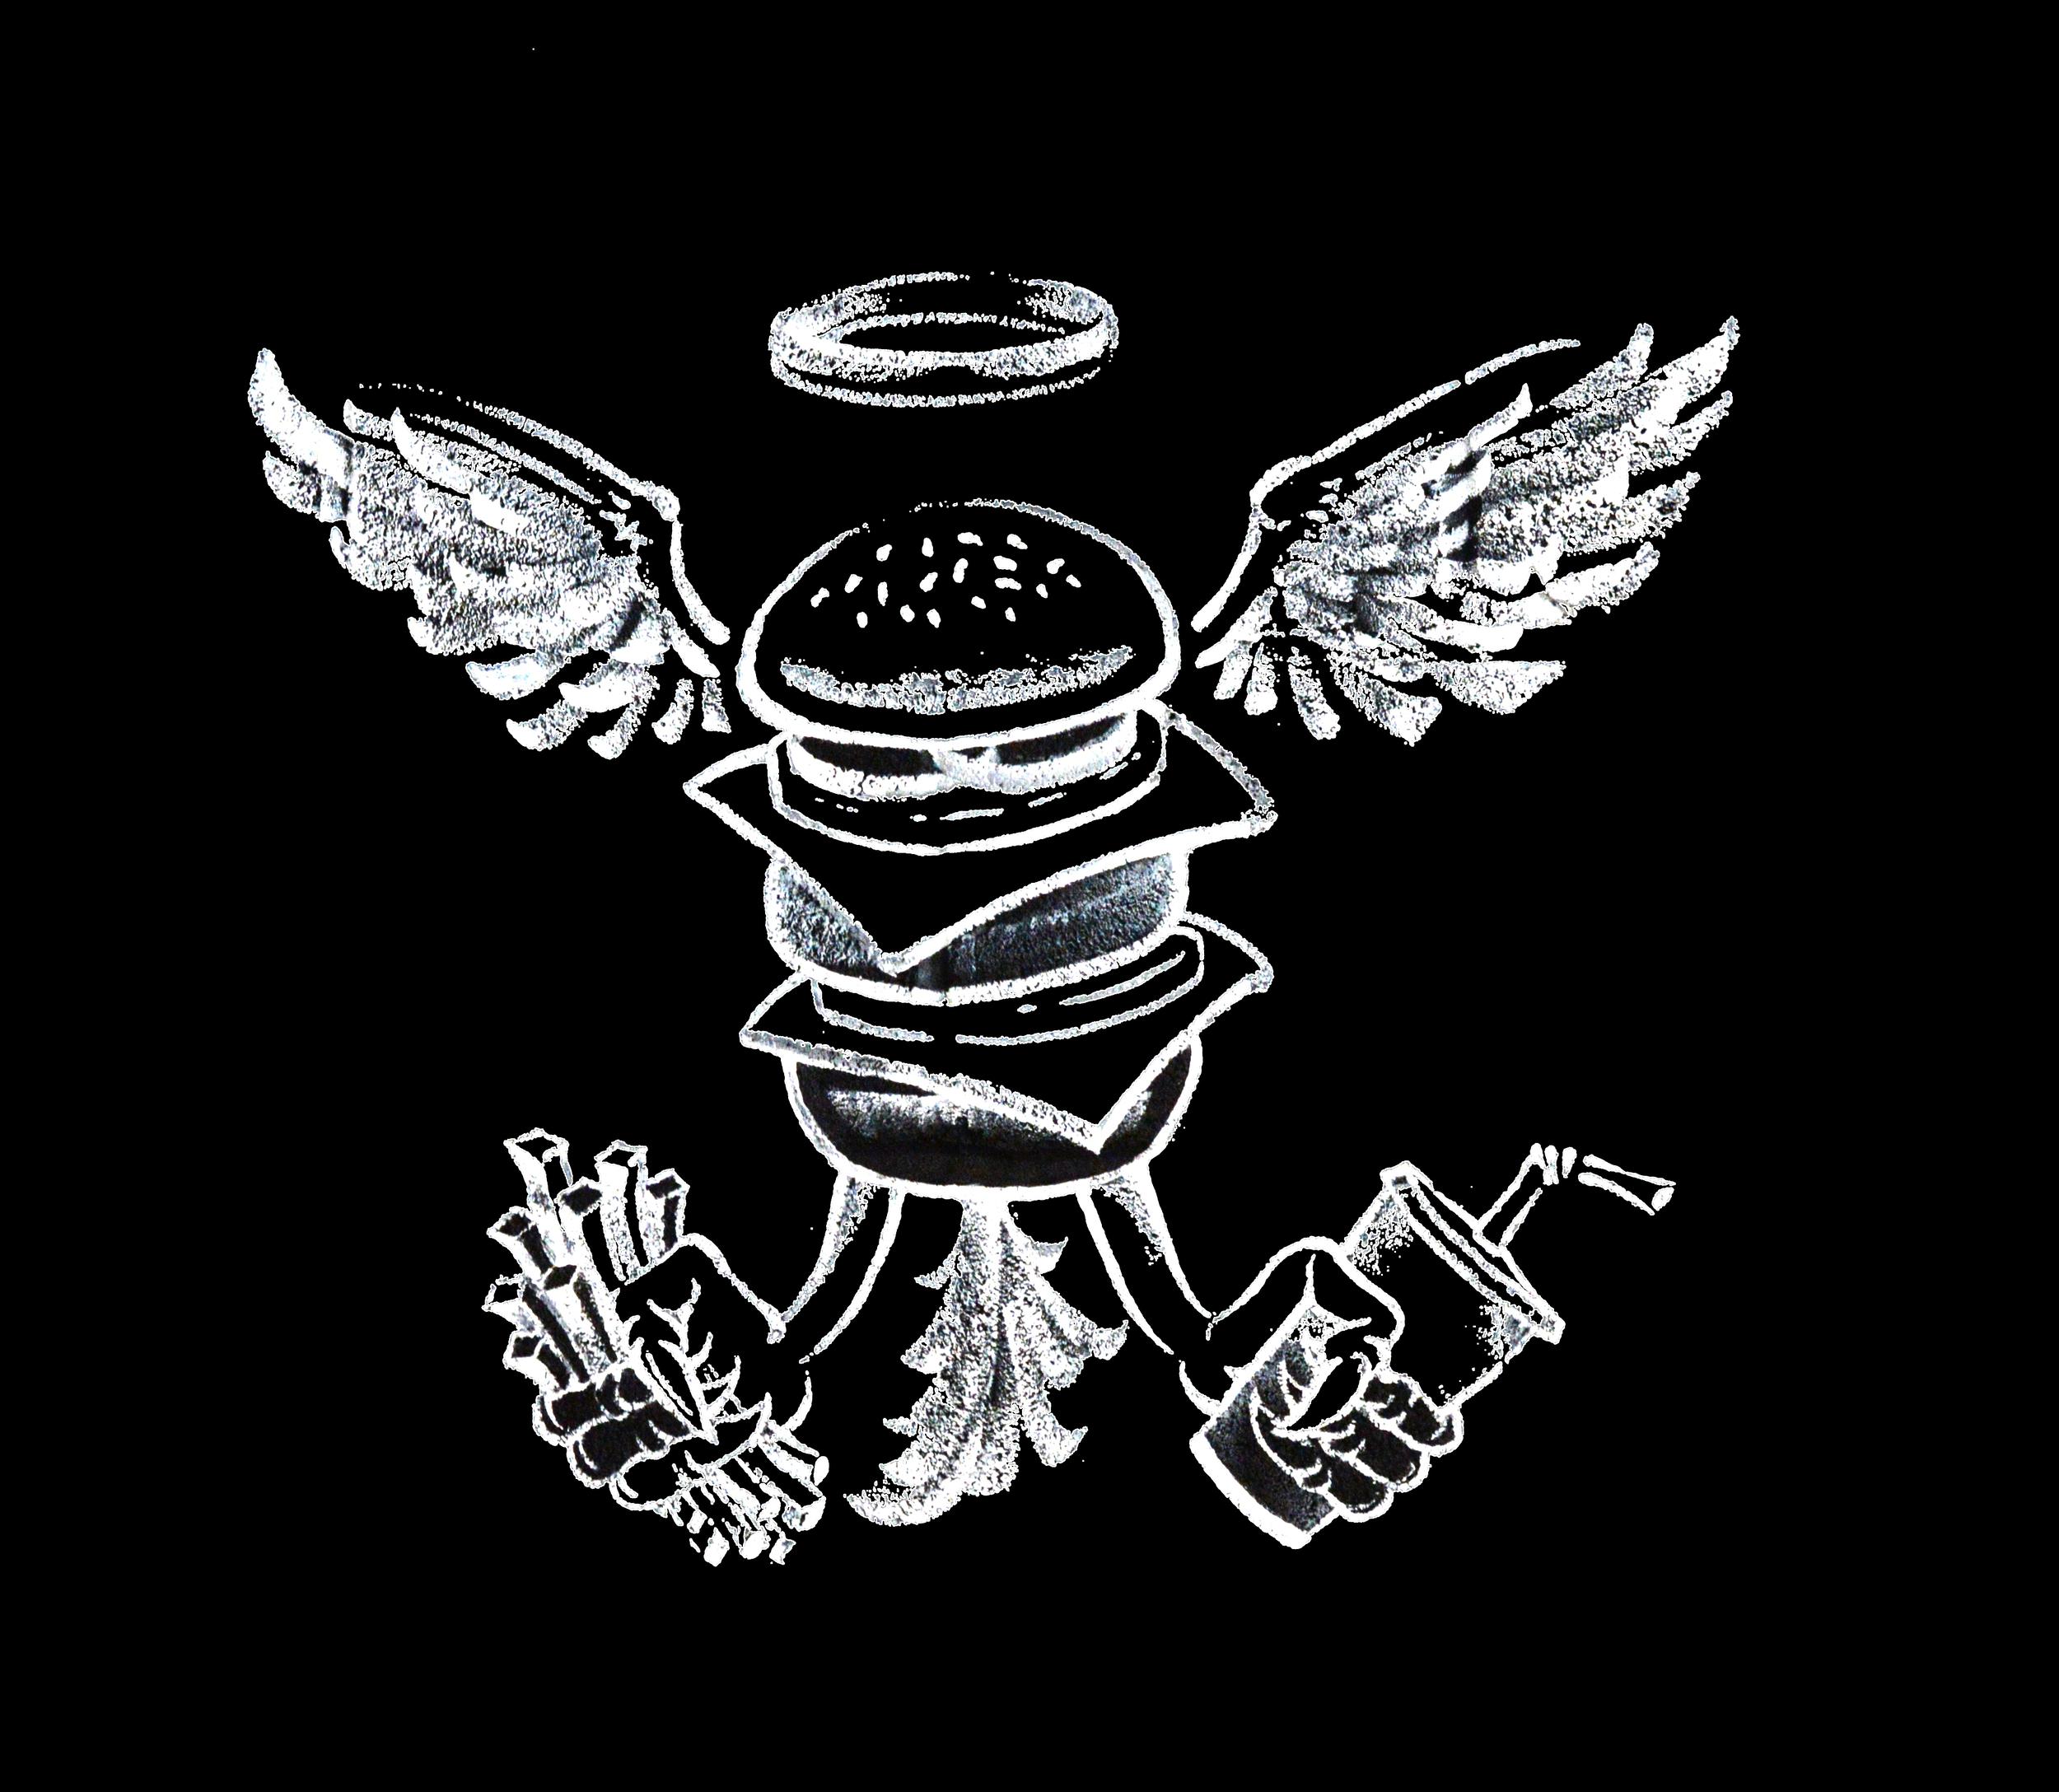 flyburger2.jpg